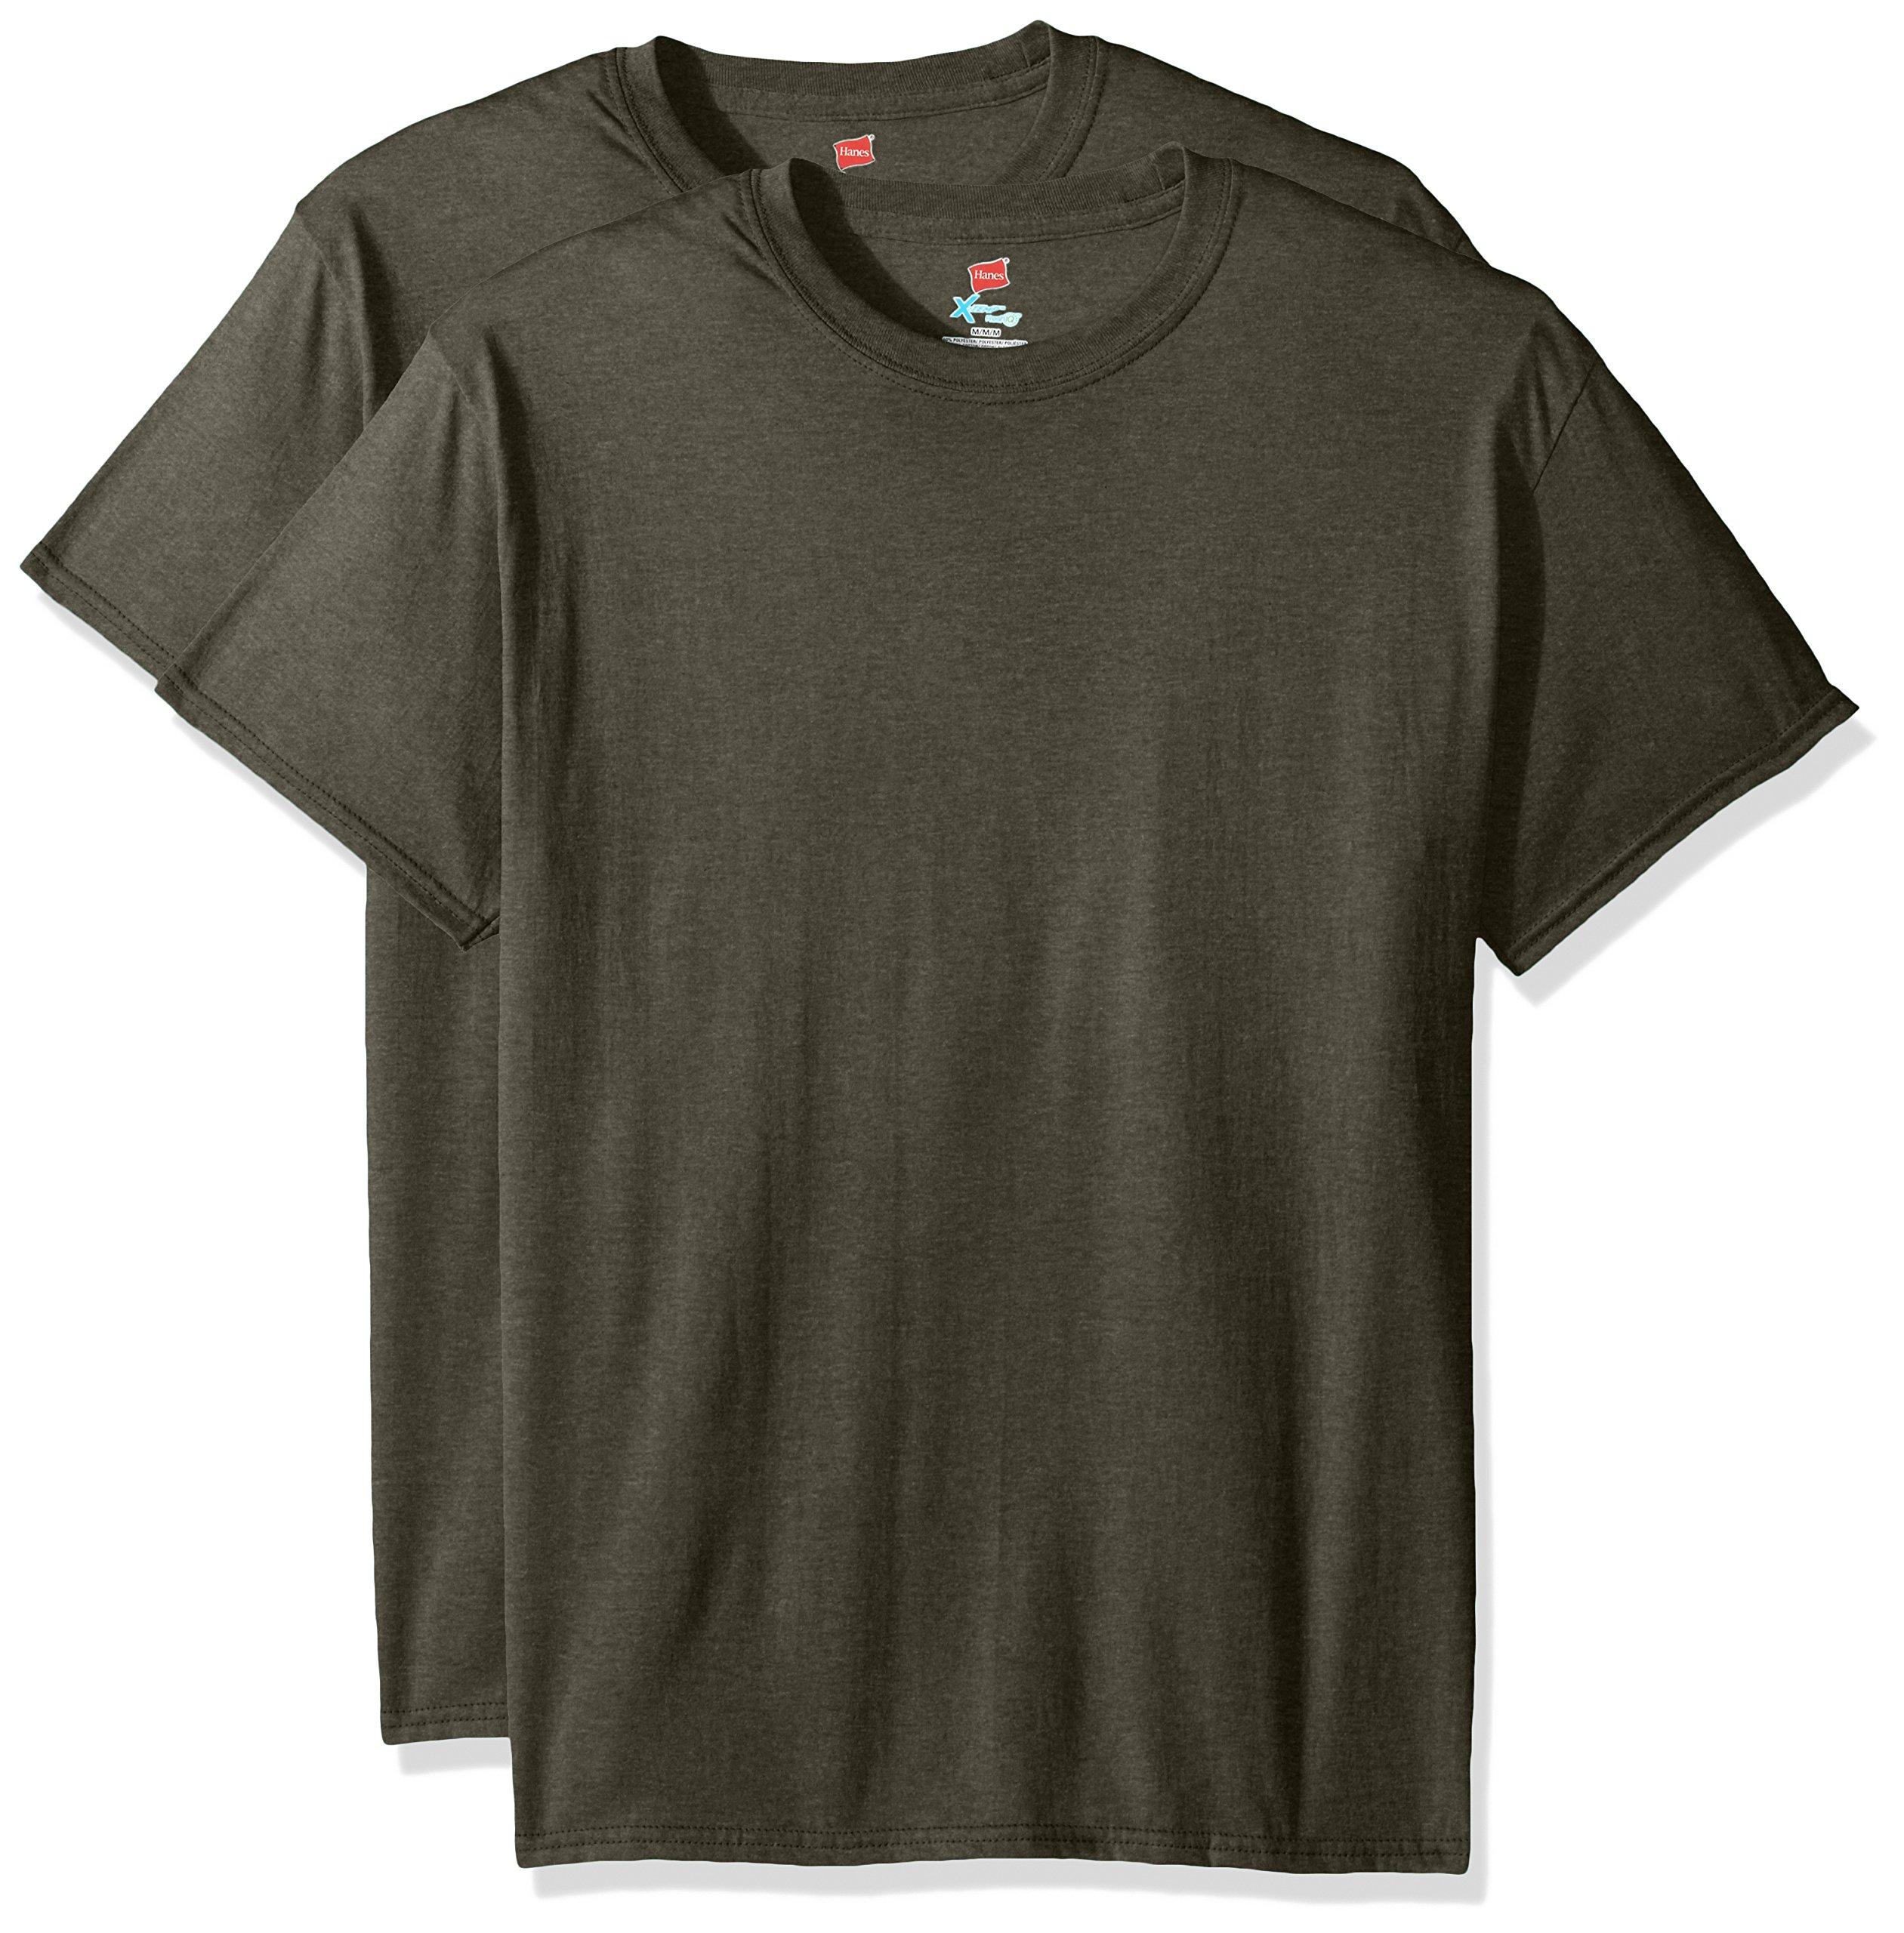 Hanes Men's Short Sleeve X-Temp W/FreshIQ T-Shirt 2-Pack, Military Green Heathaer, Large